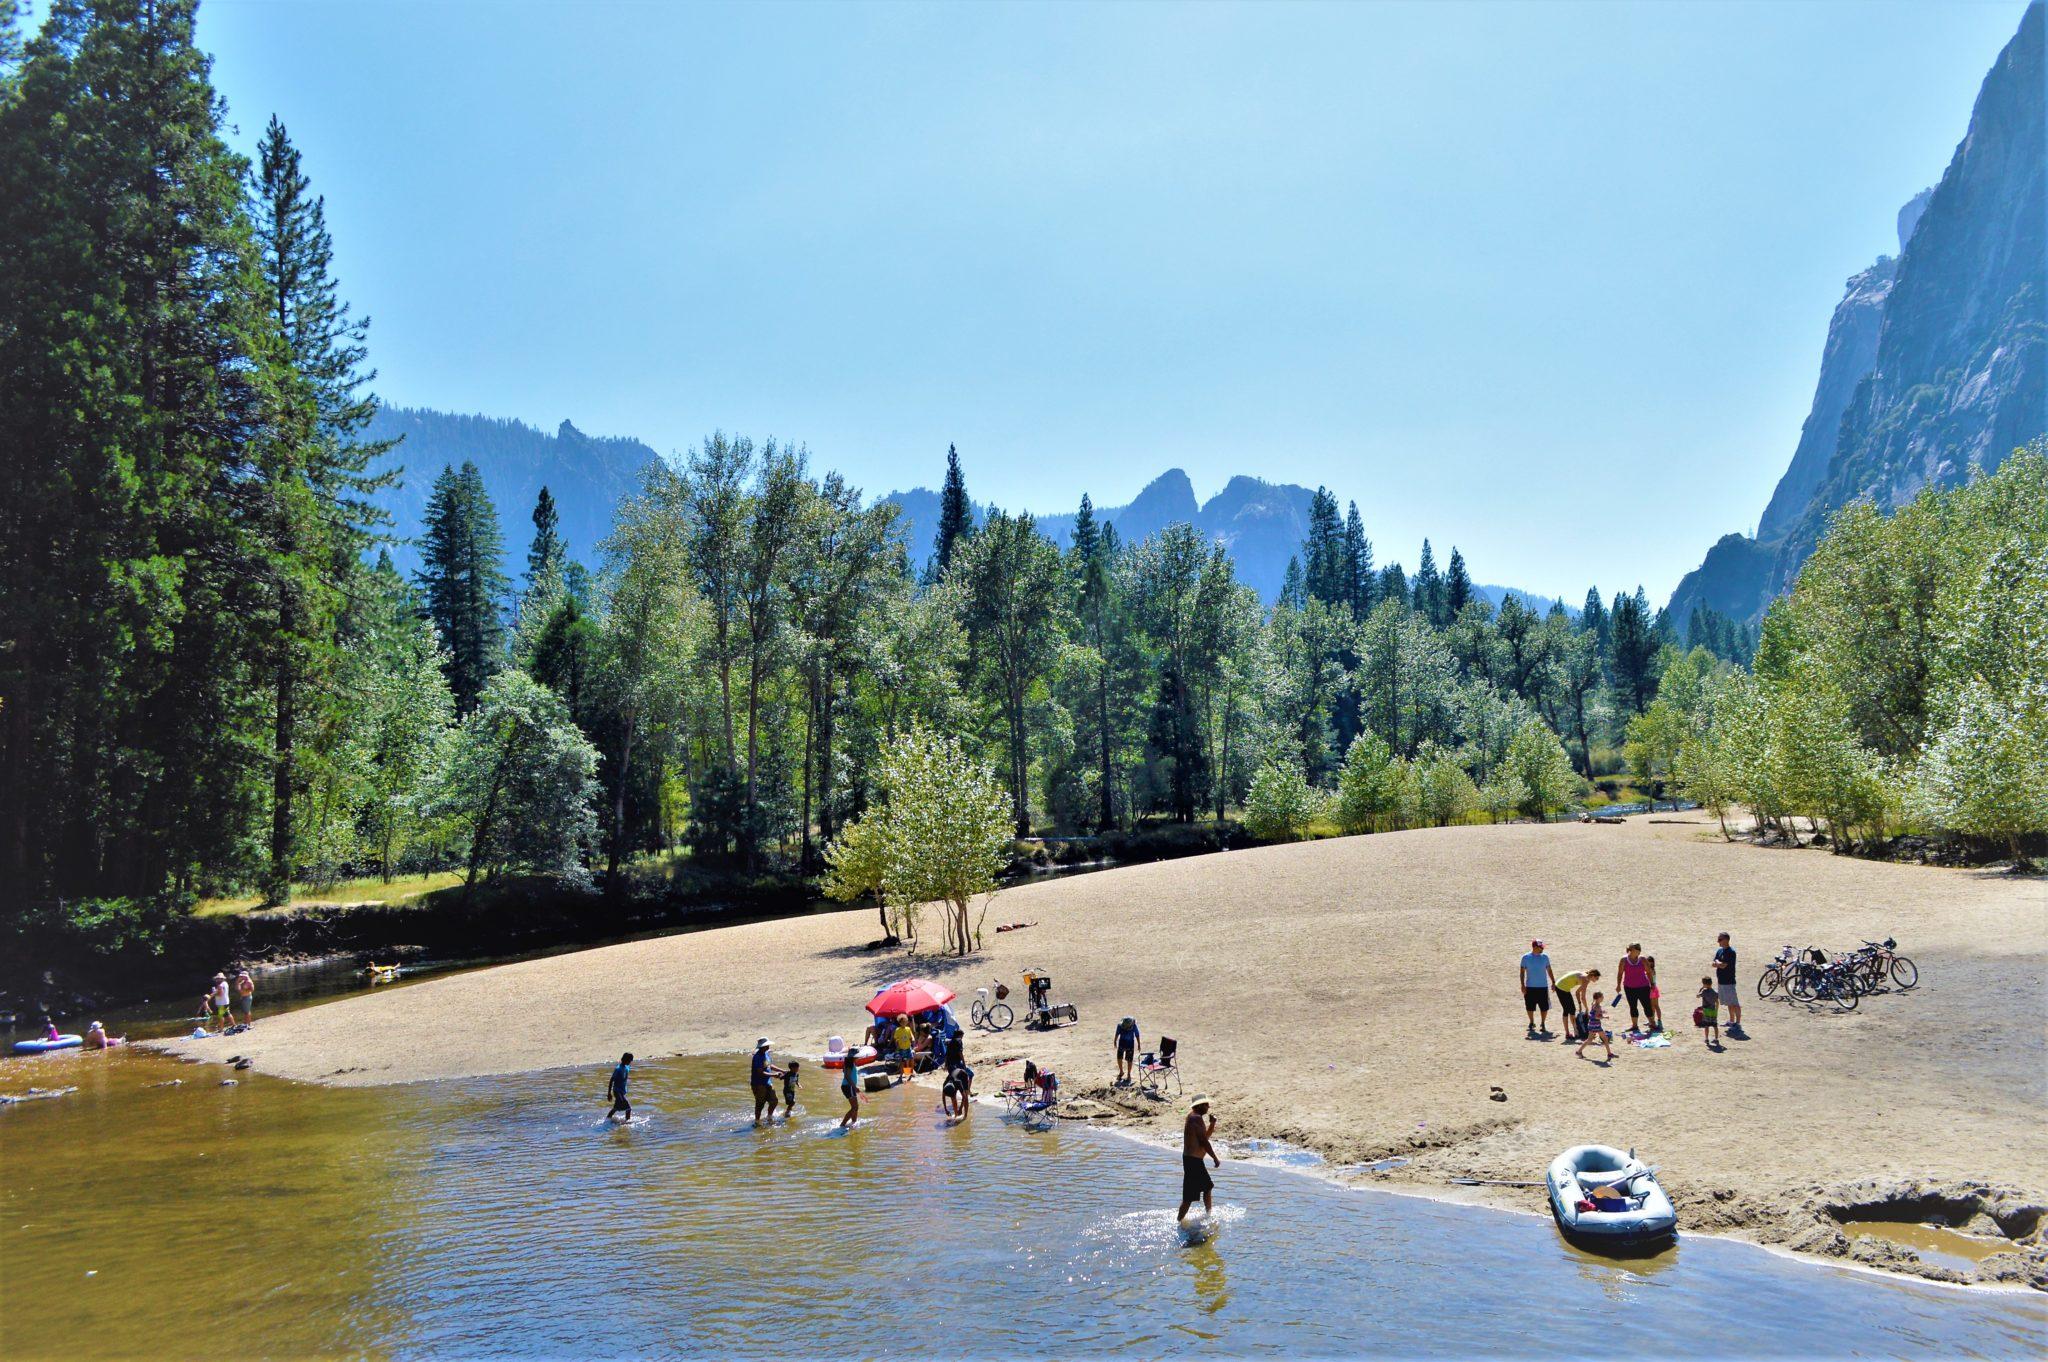 Swimming and dinghies, Yosemite National Park, California, things to do at yosemite